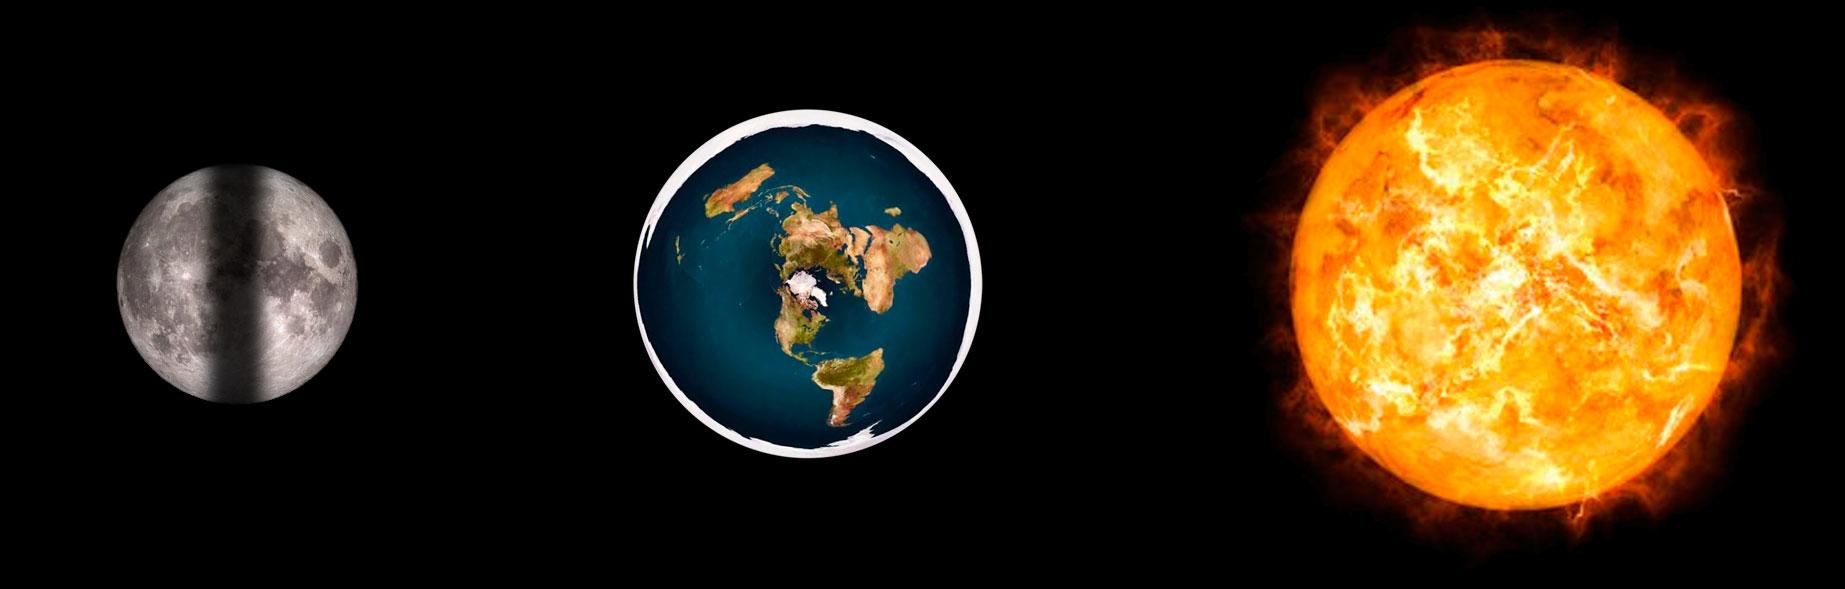 Sombras en un eclipse lunar terraplanista